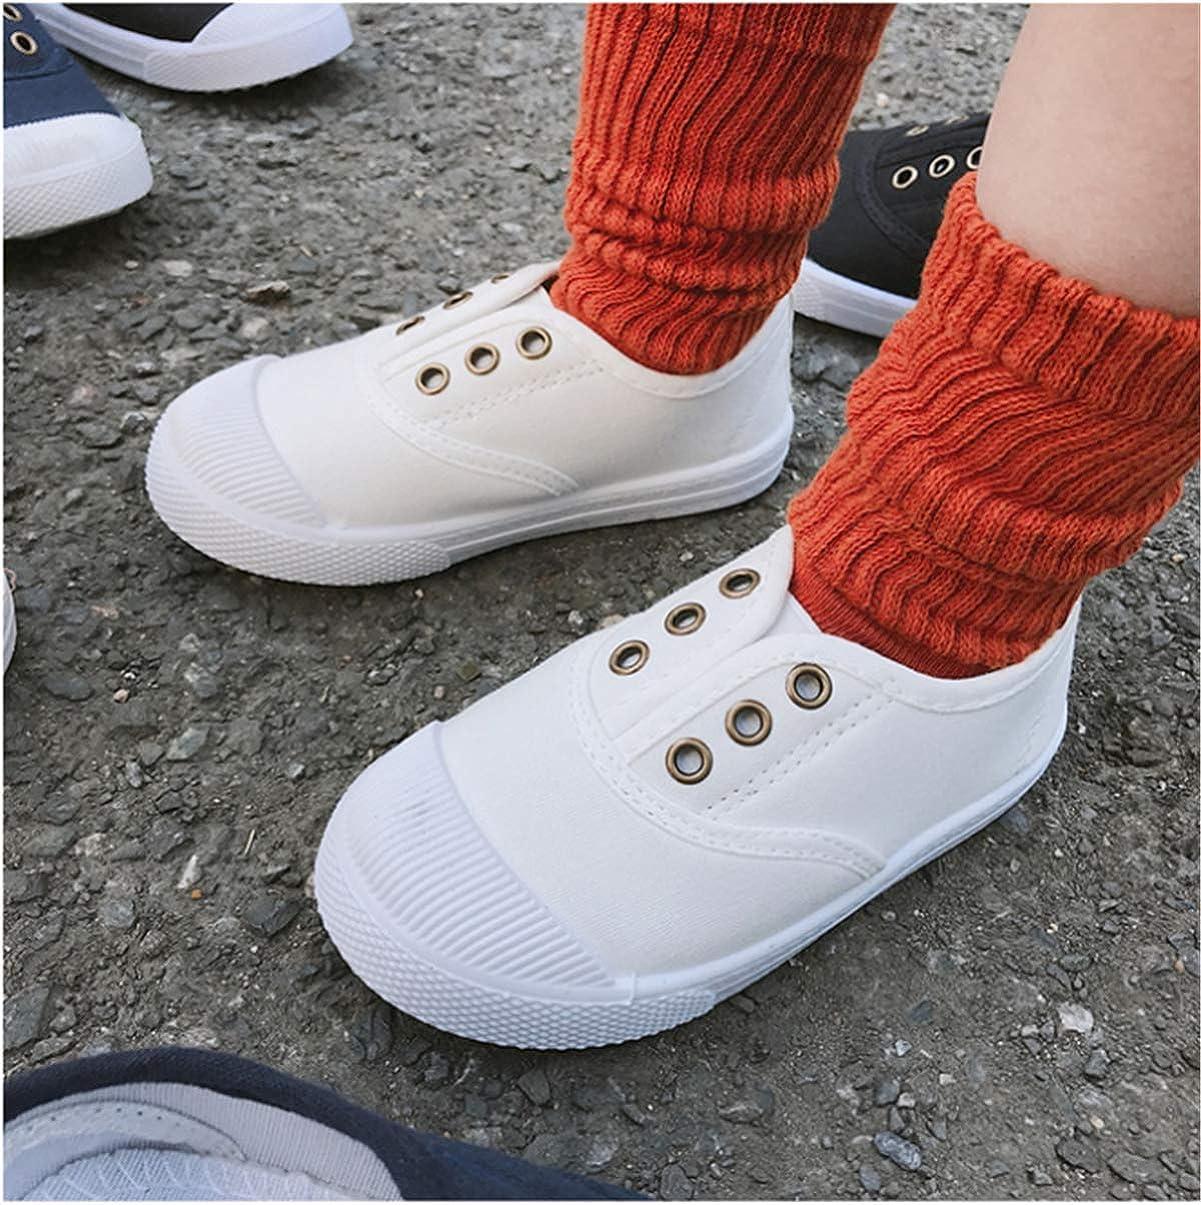 E-FAK Kids Canvas Sneaker Toddler Boys Girls Slip On Tennis Shoes Lightweight Fashion Casual Running Shoe